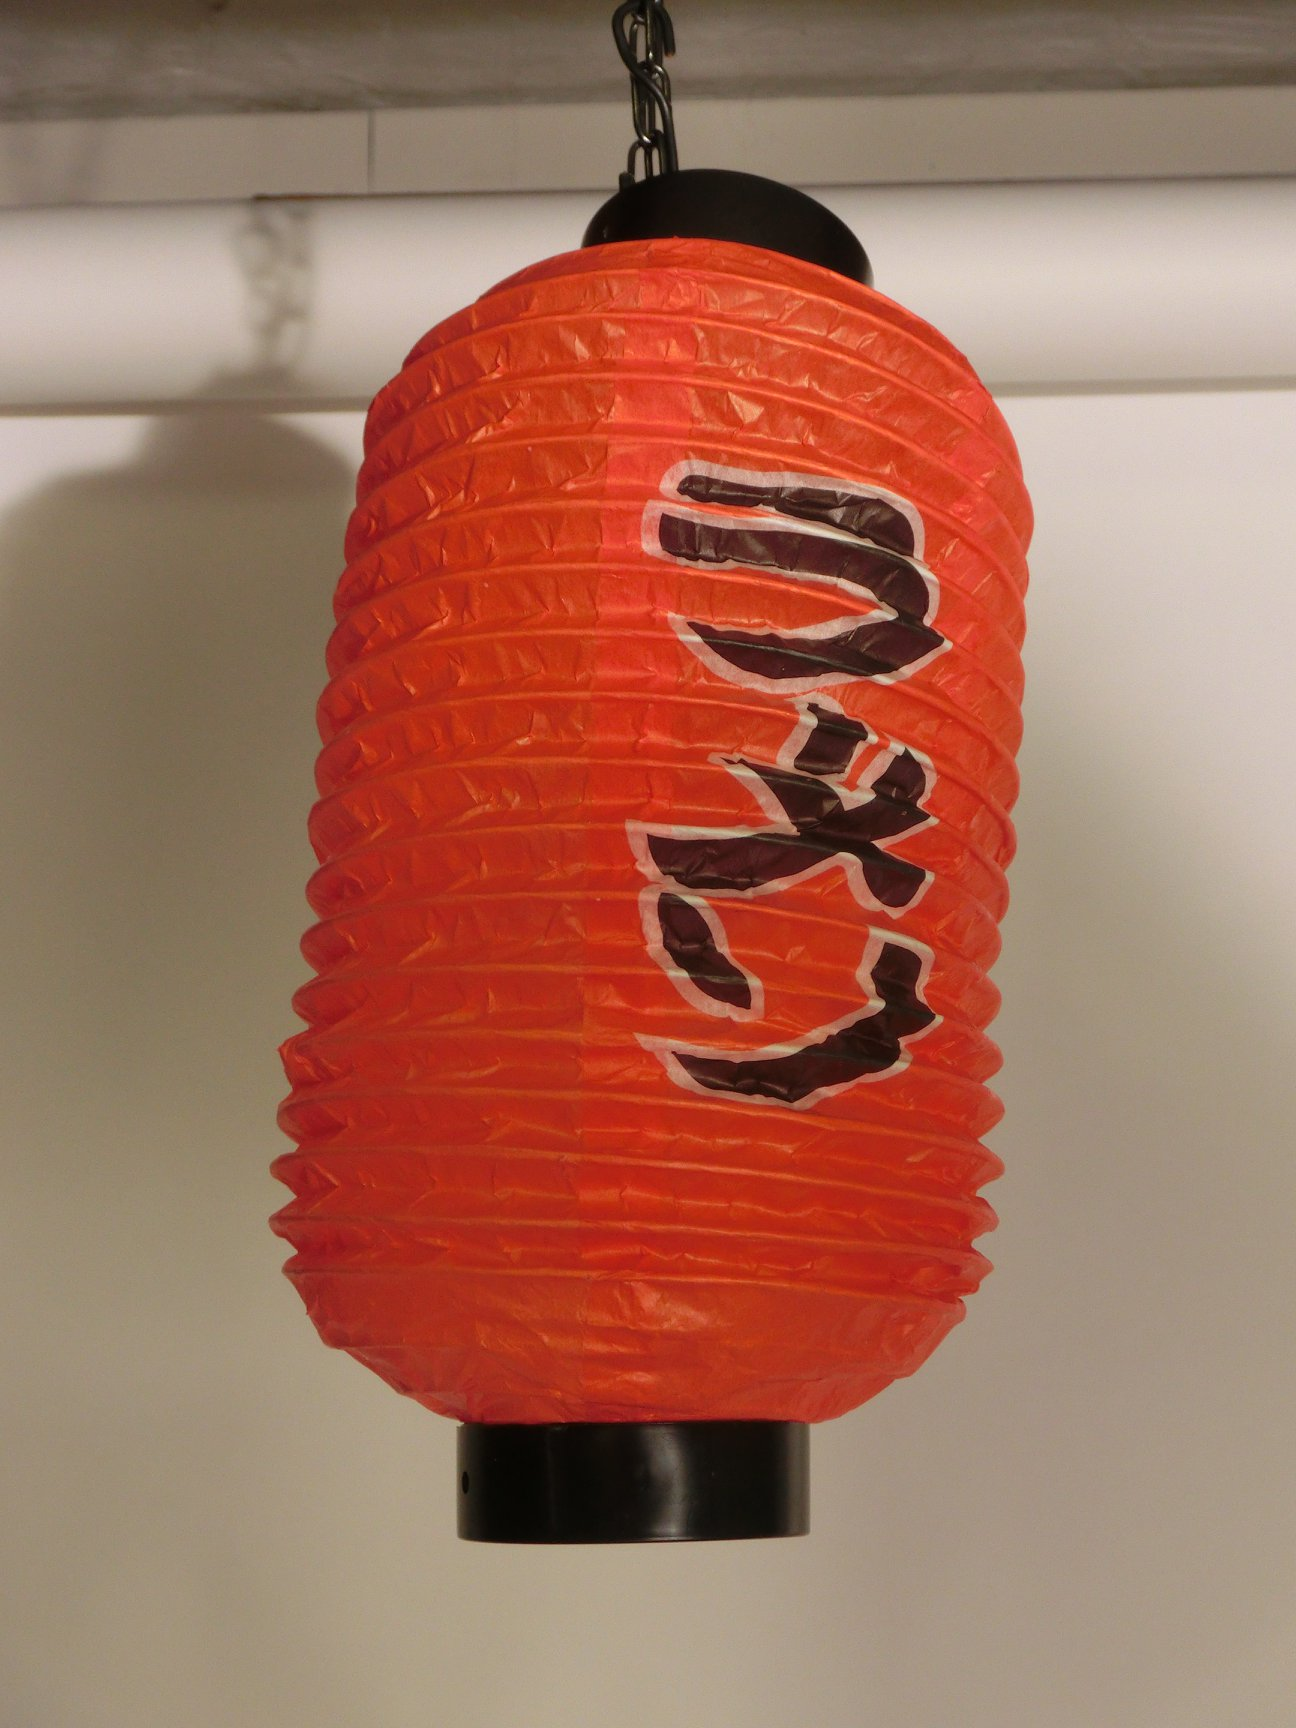 Frühlingsfeste Janpanischer Lampion zum Hanami-Fest.jpg